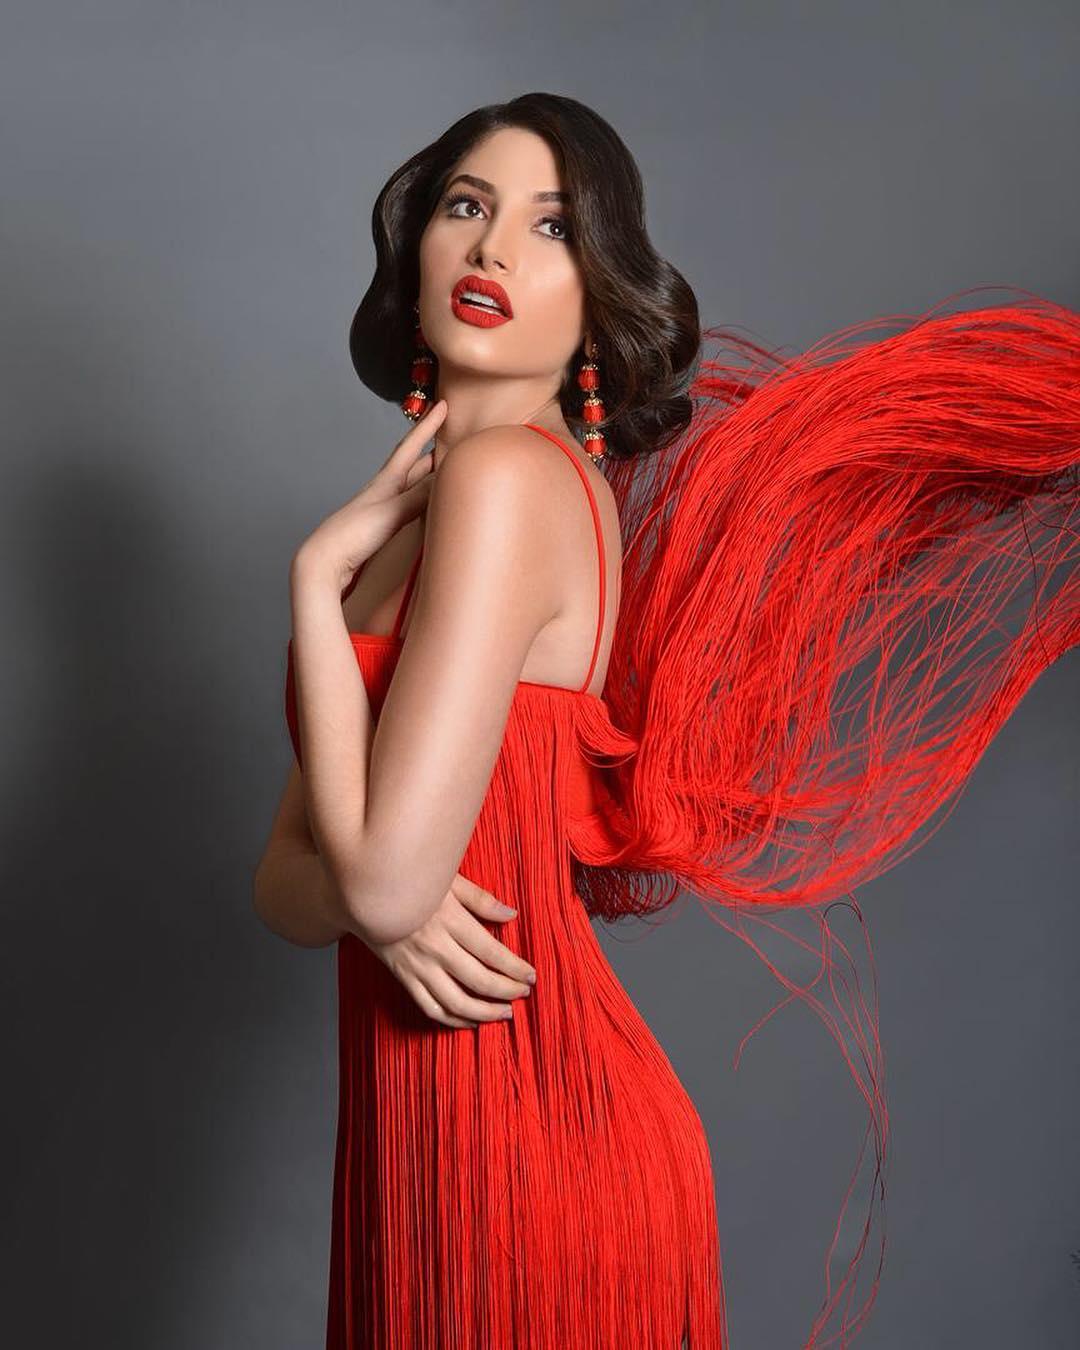 nariman battikha, reyna hispanoamericana 2018/top 10 de miss supranational 2018. - Página 2 37382313